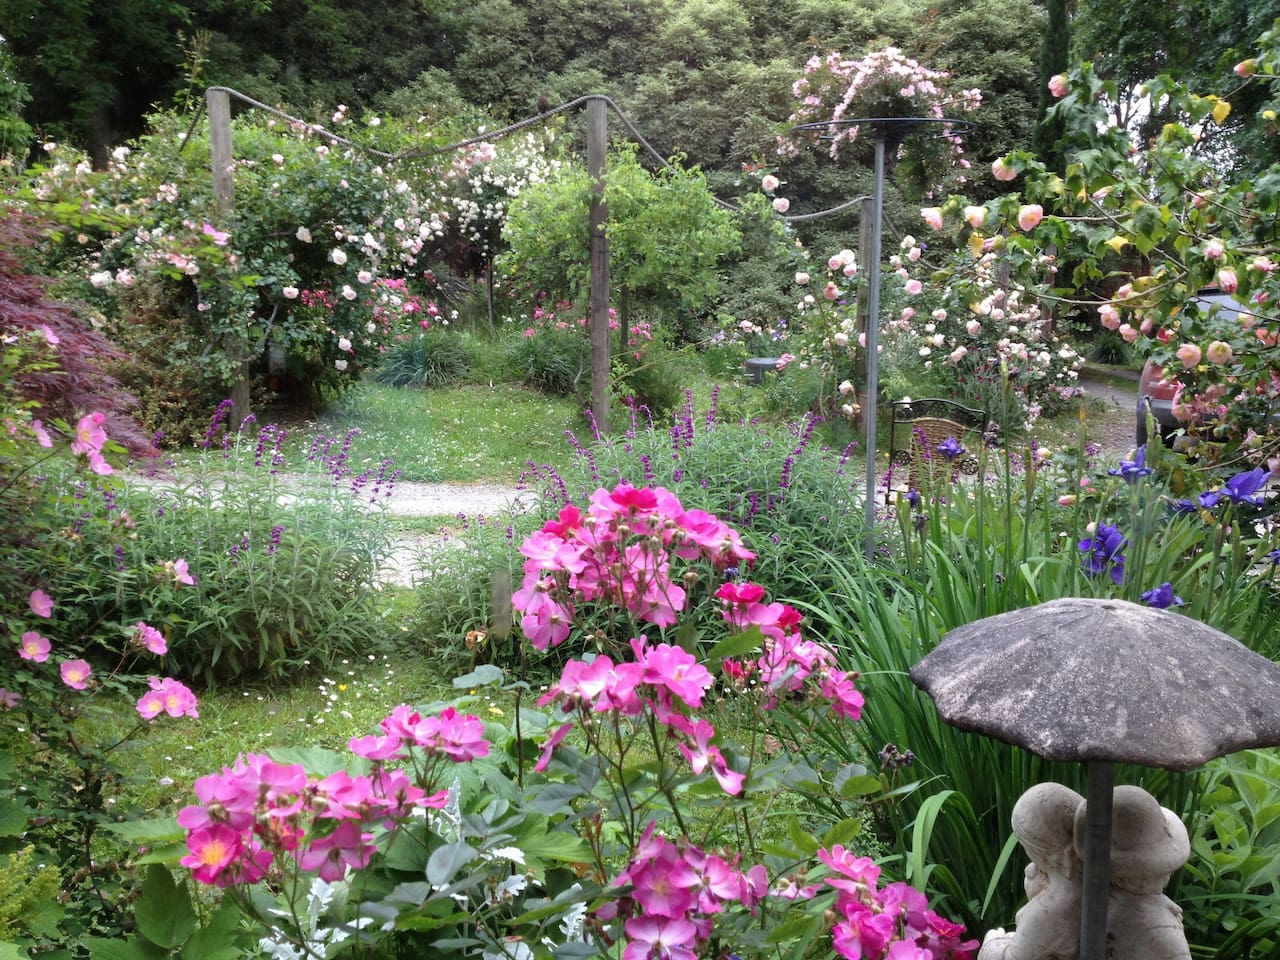 Perfumed front garden in spring